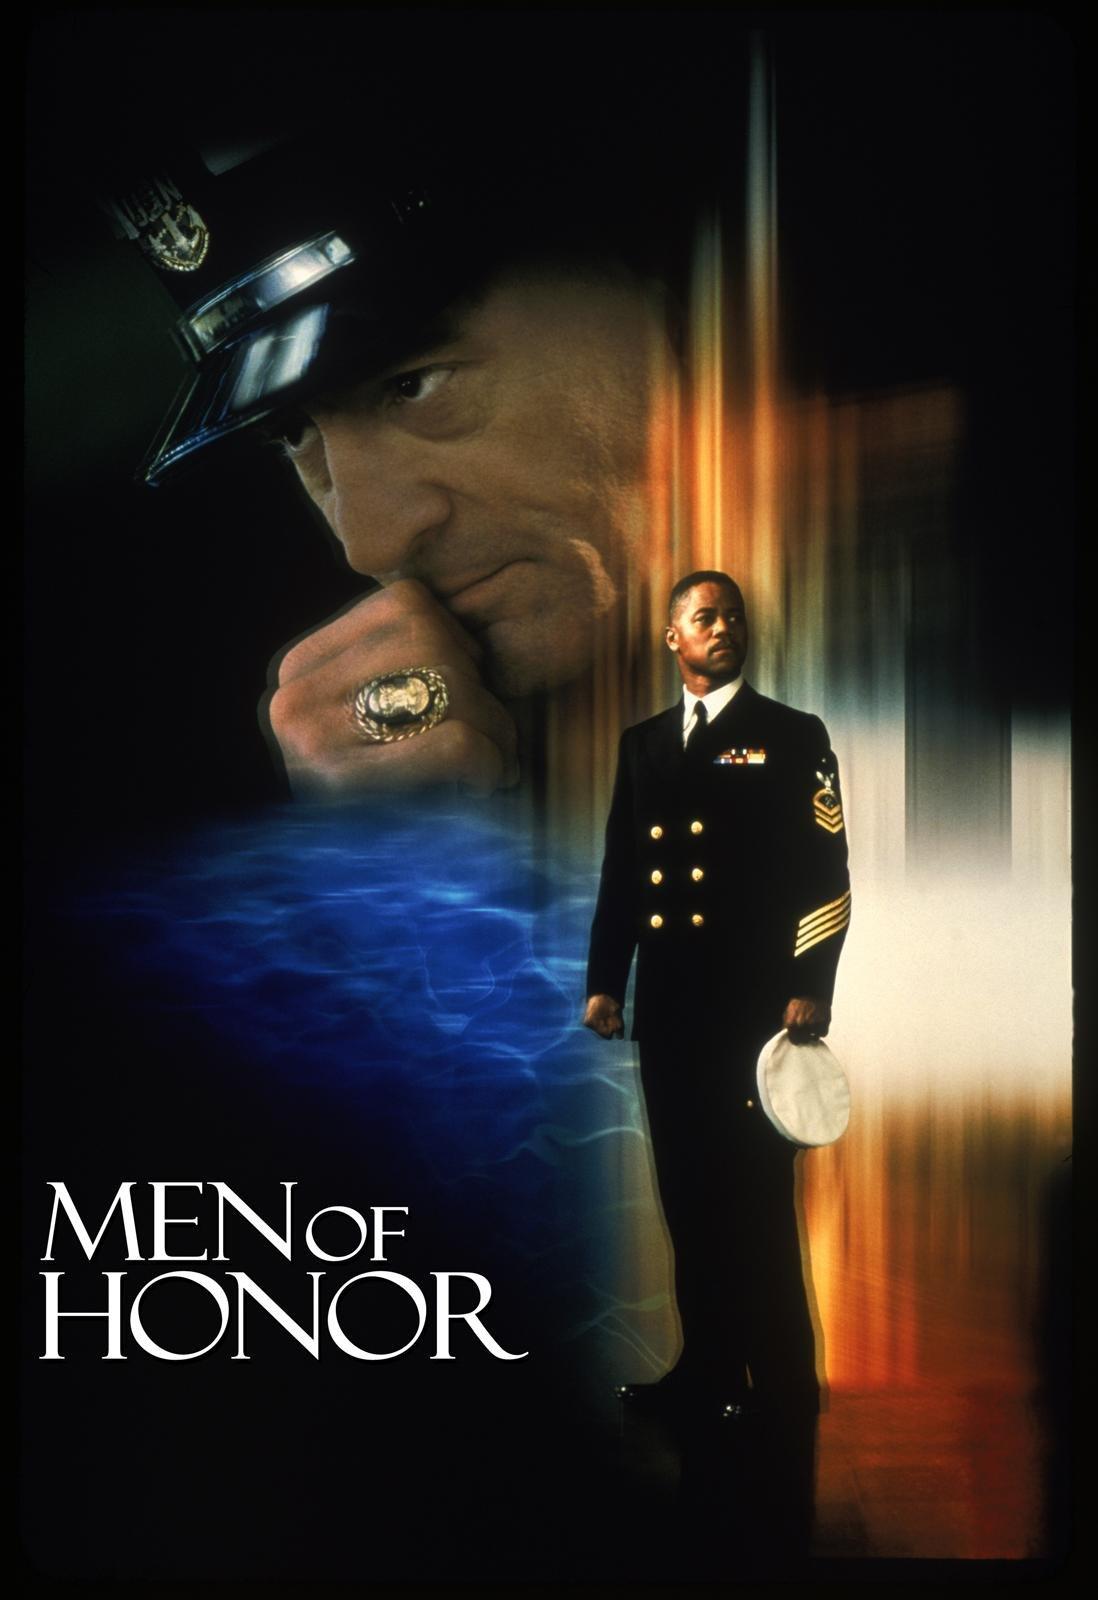 man of honor full movie watch online free